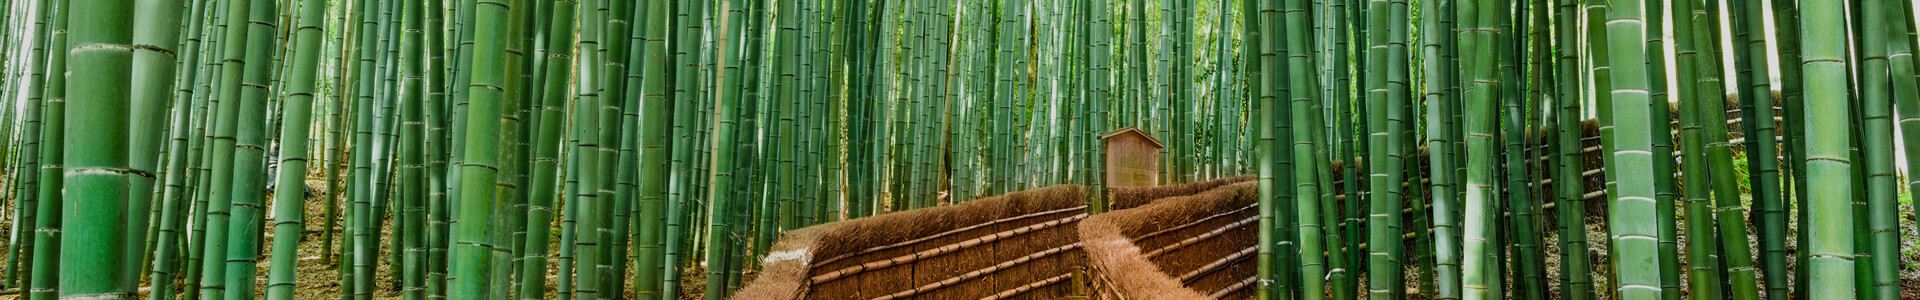 Bambus Ausgraben In 6 Schritten Anleitungencom